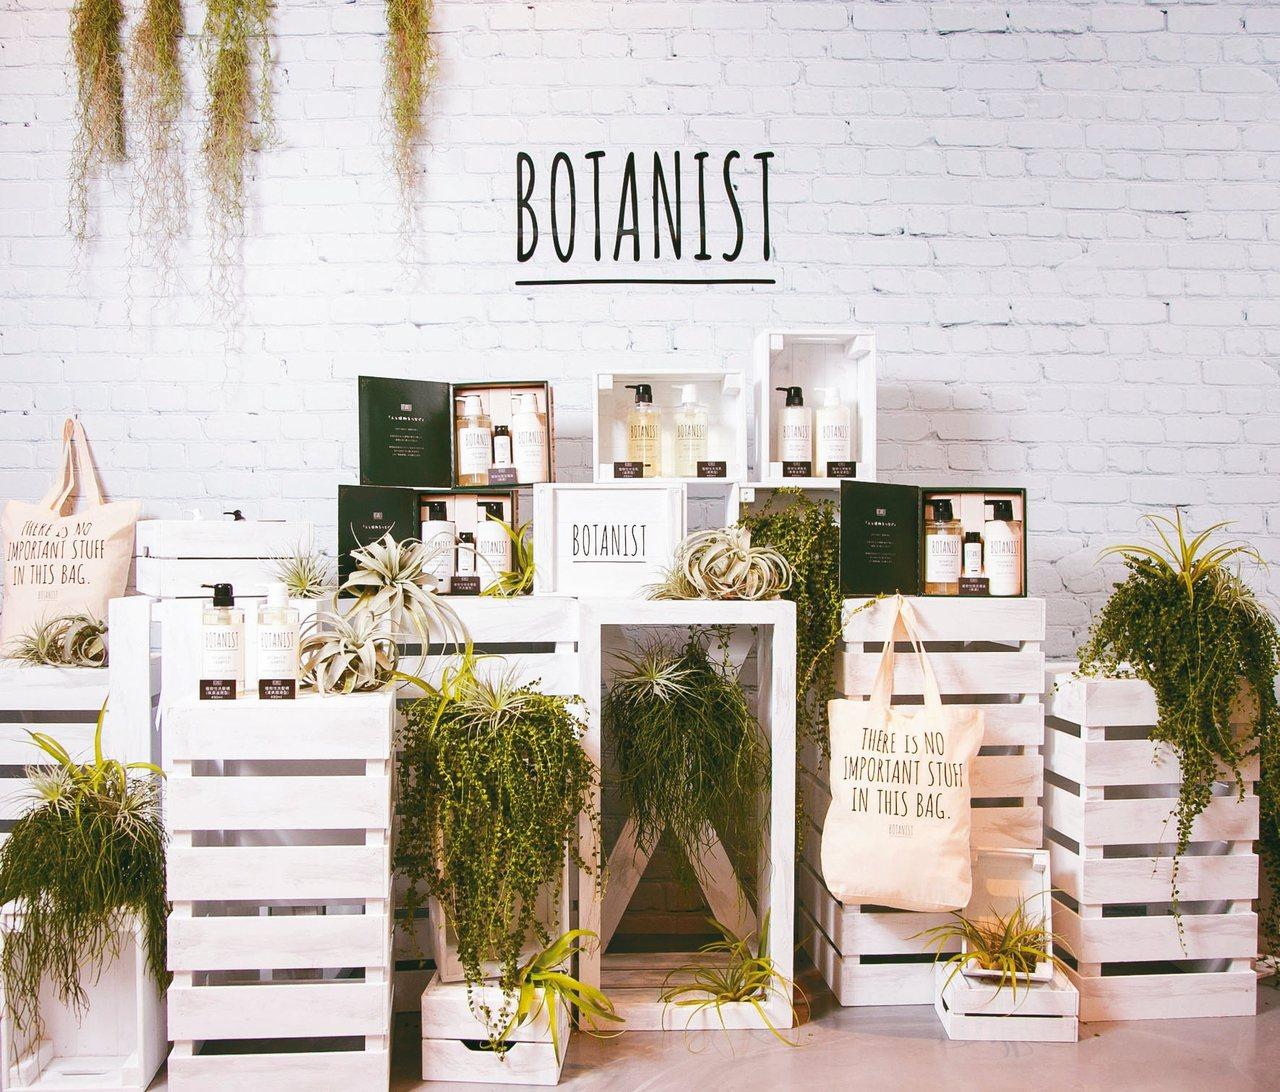 「BOTANIST」以開架的價格、專櫃級的品質搶攻美妝市場,以療癒的自然植物力,為髮絲和每一吋肌膚帶來潔淨與潤澤的美好沐浴時光。